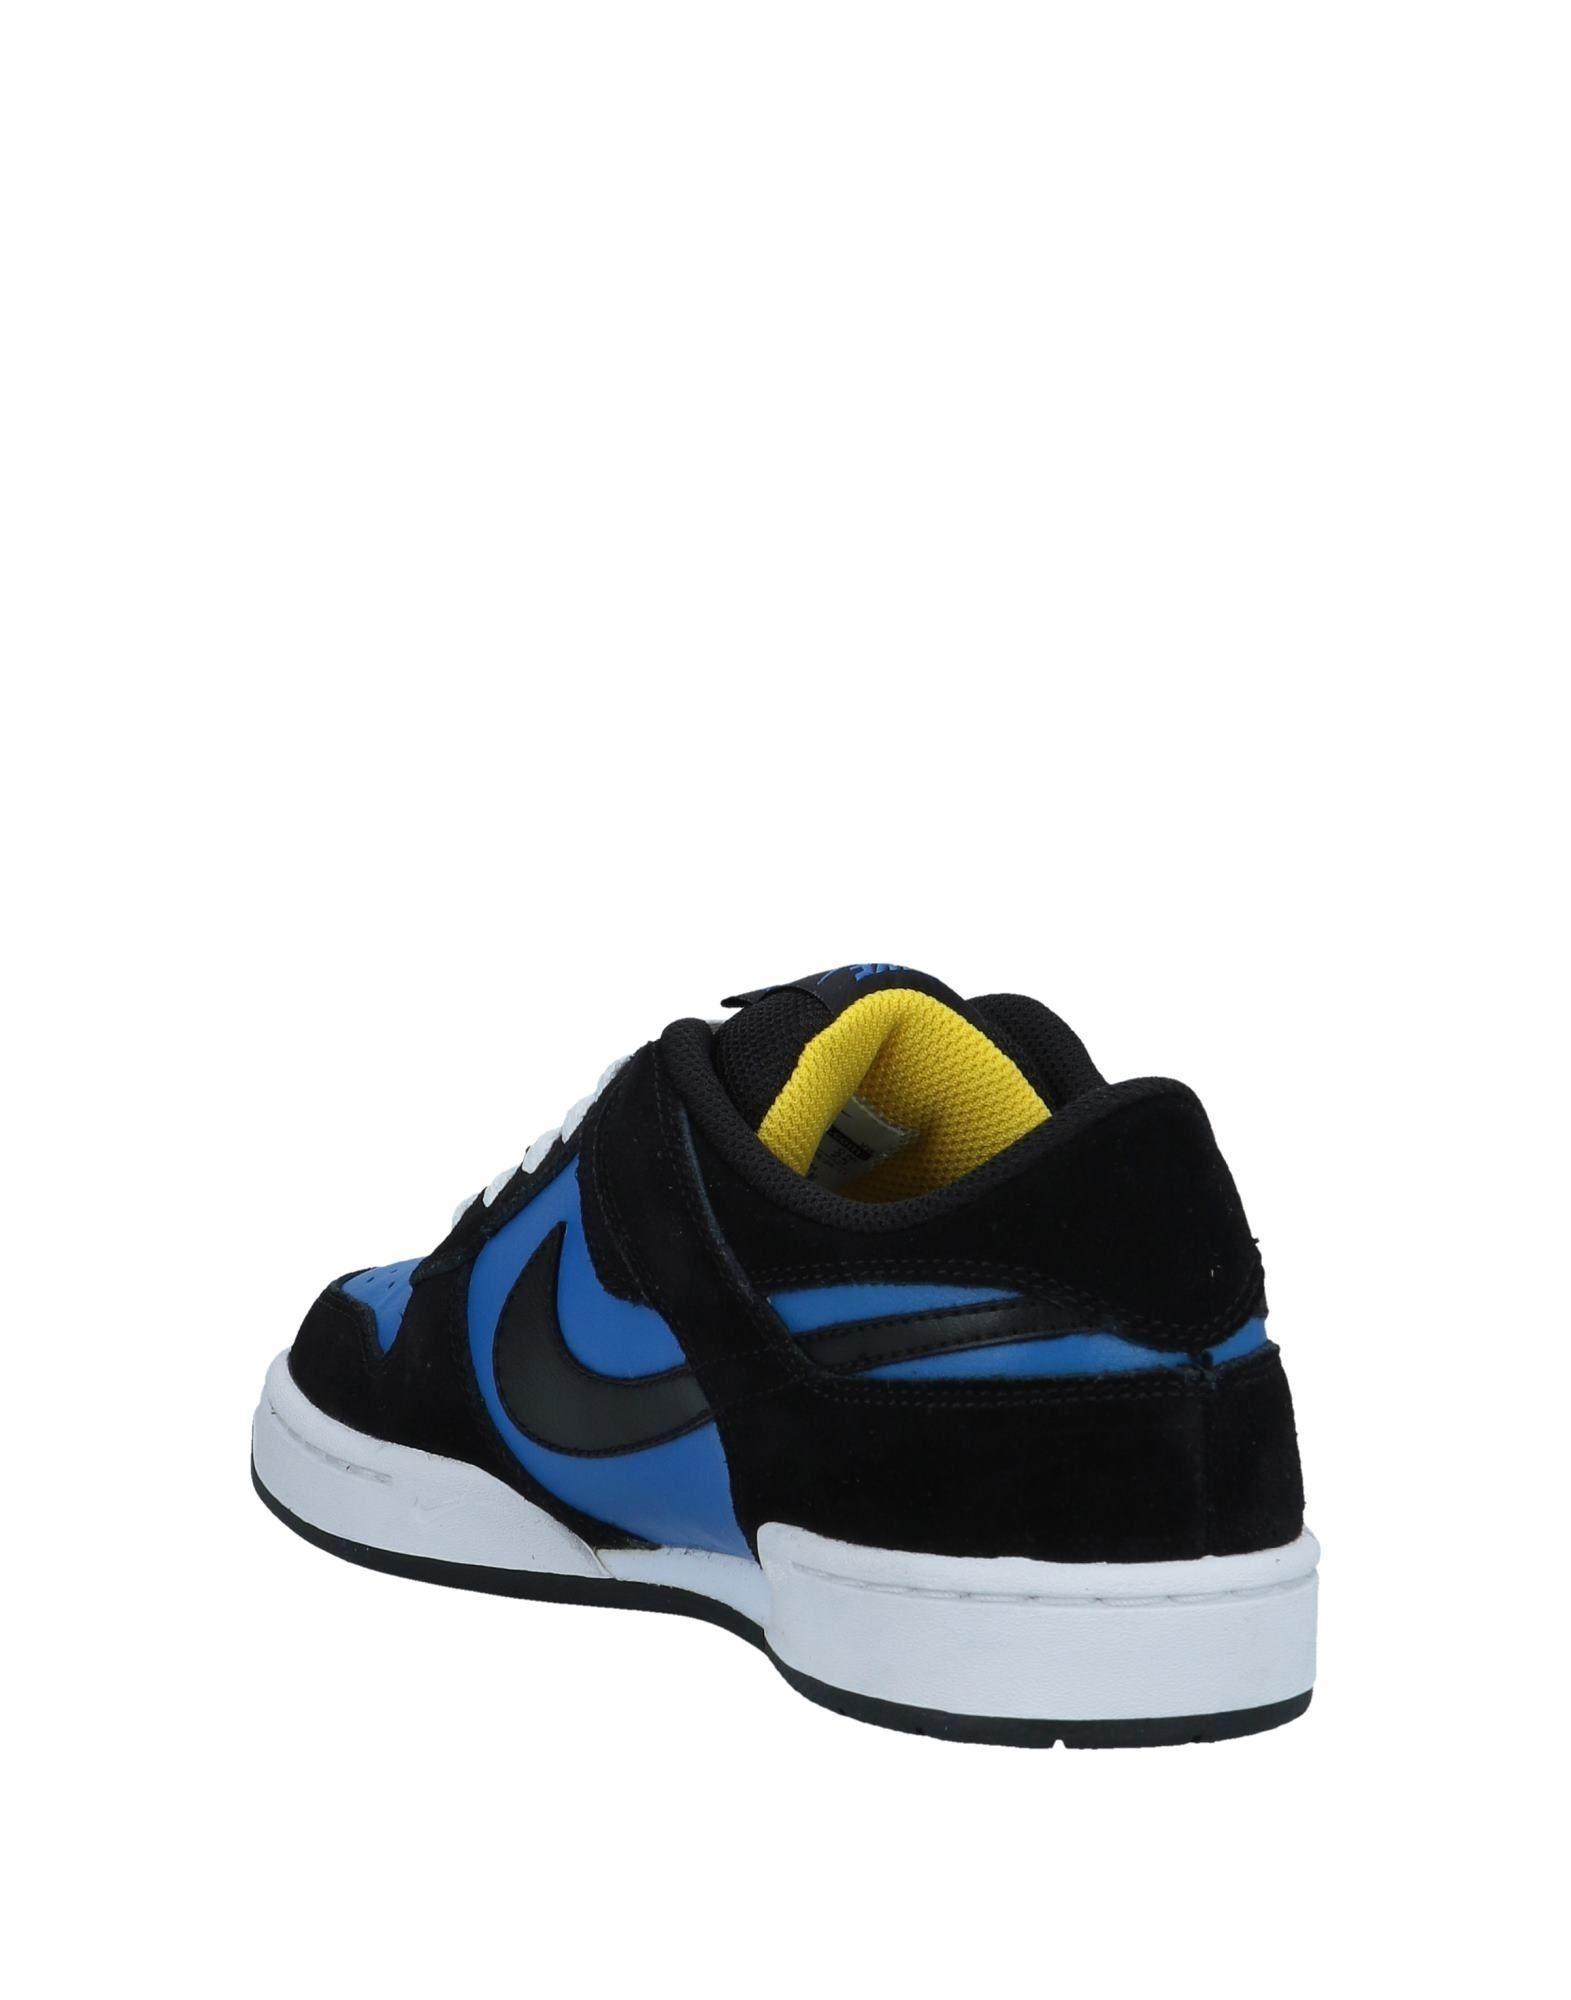 Nike Sneakers - Canada Men Nike Sneakers online on  Canada - - 11549132RW 607f9f